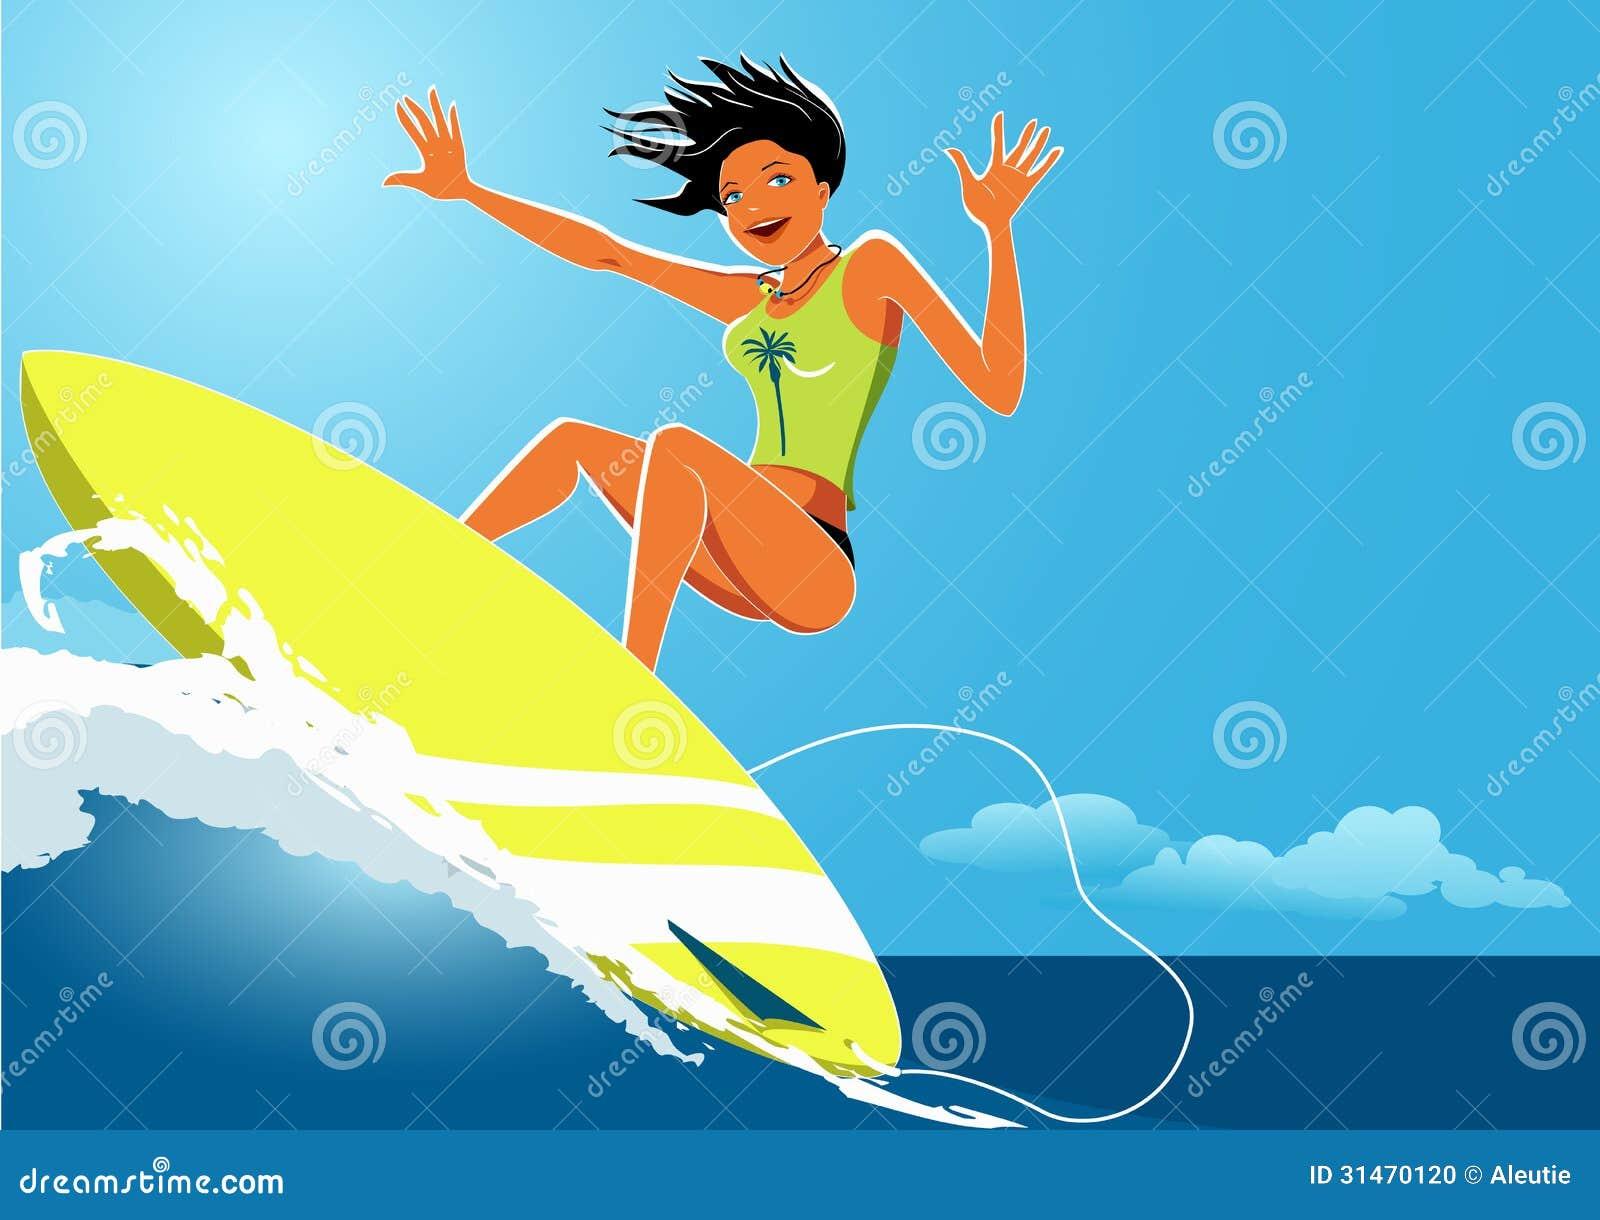 Surfer girls ball kicking